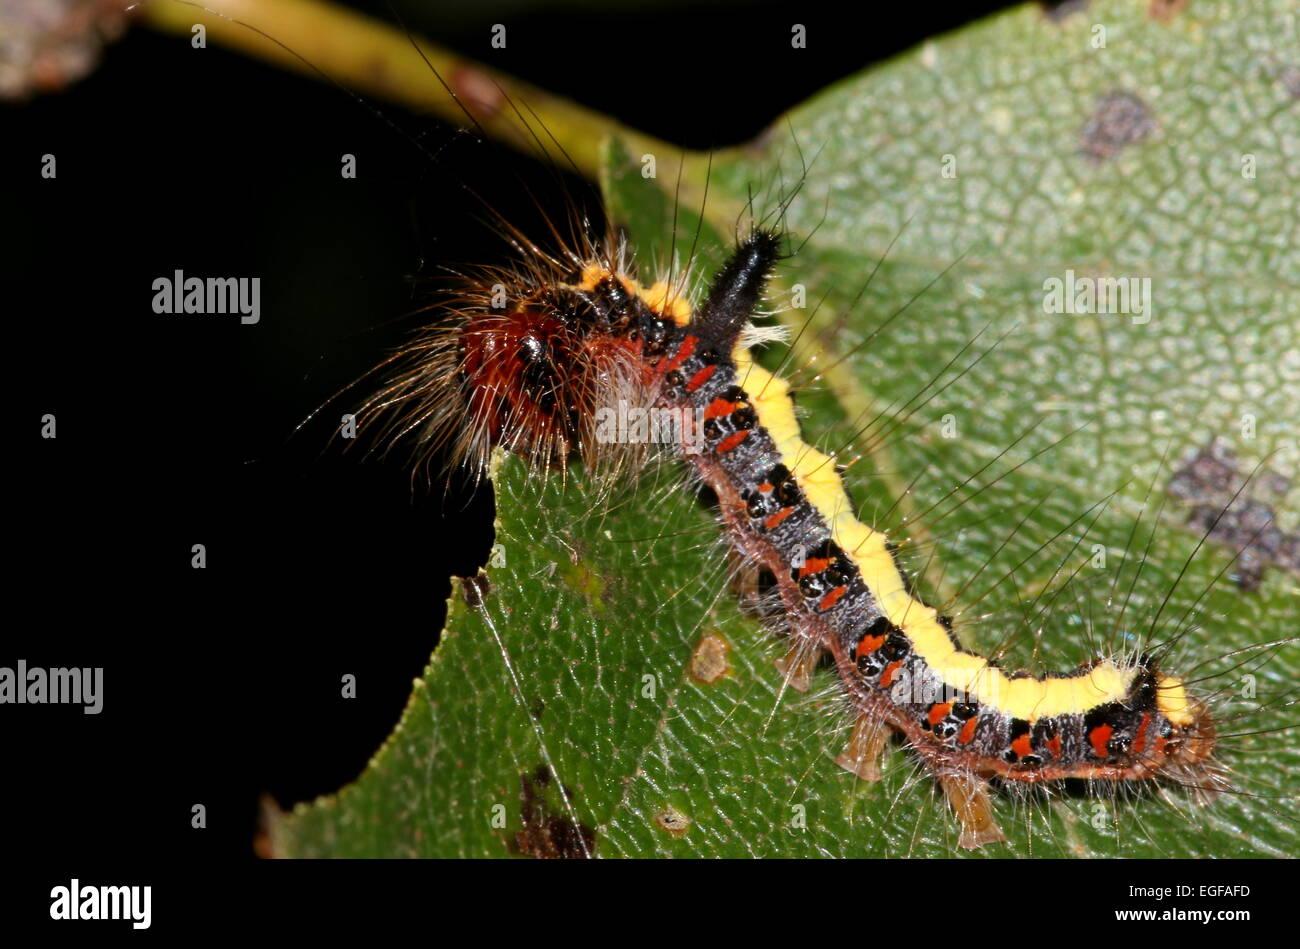 Colourful caterpillar of the European Grey Dagger moth (Acronicta psi) - Stock Image